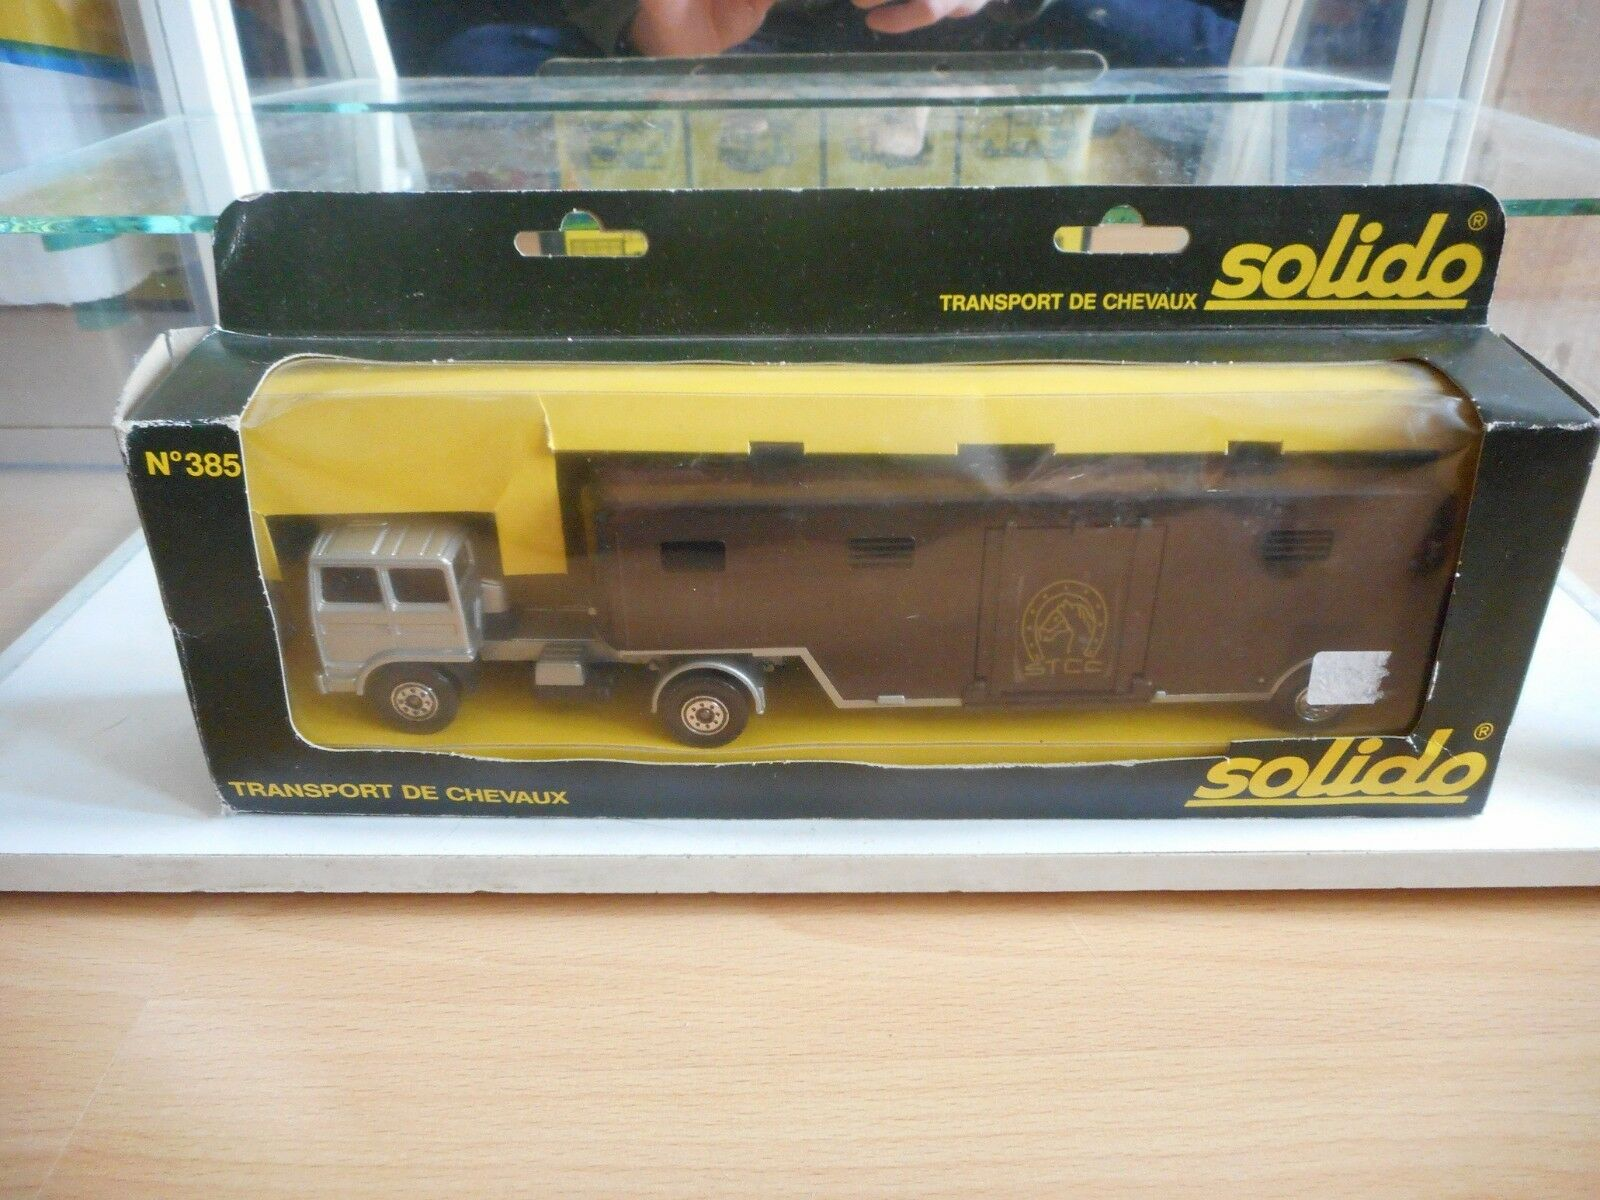 Solido Saviem Transport de Chevaux in Grey/Brown in Box